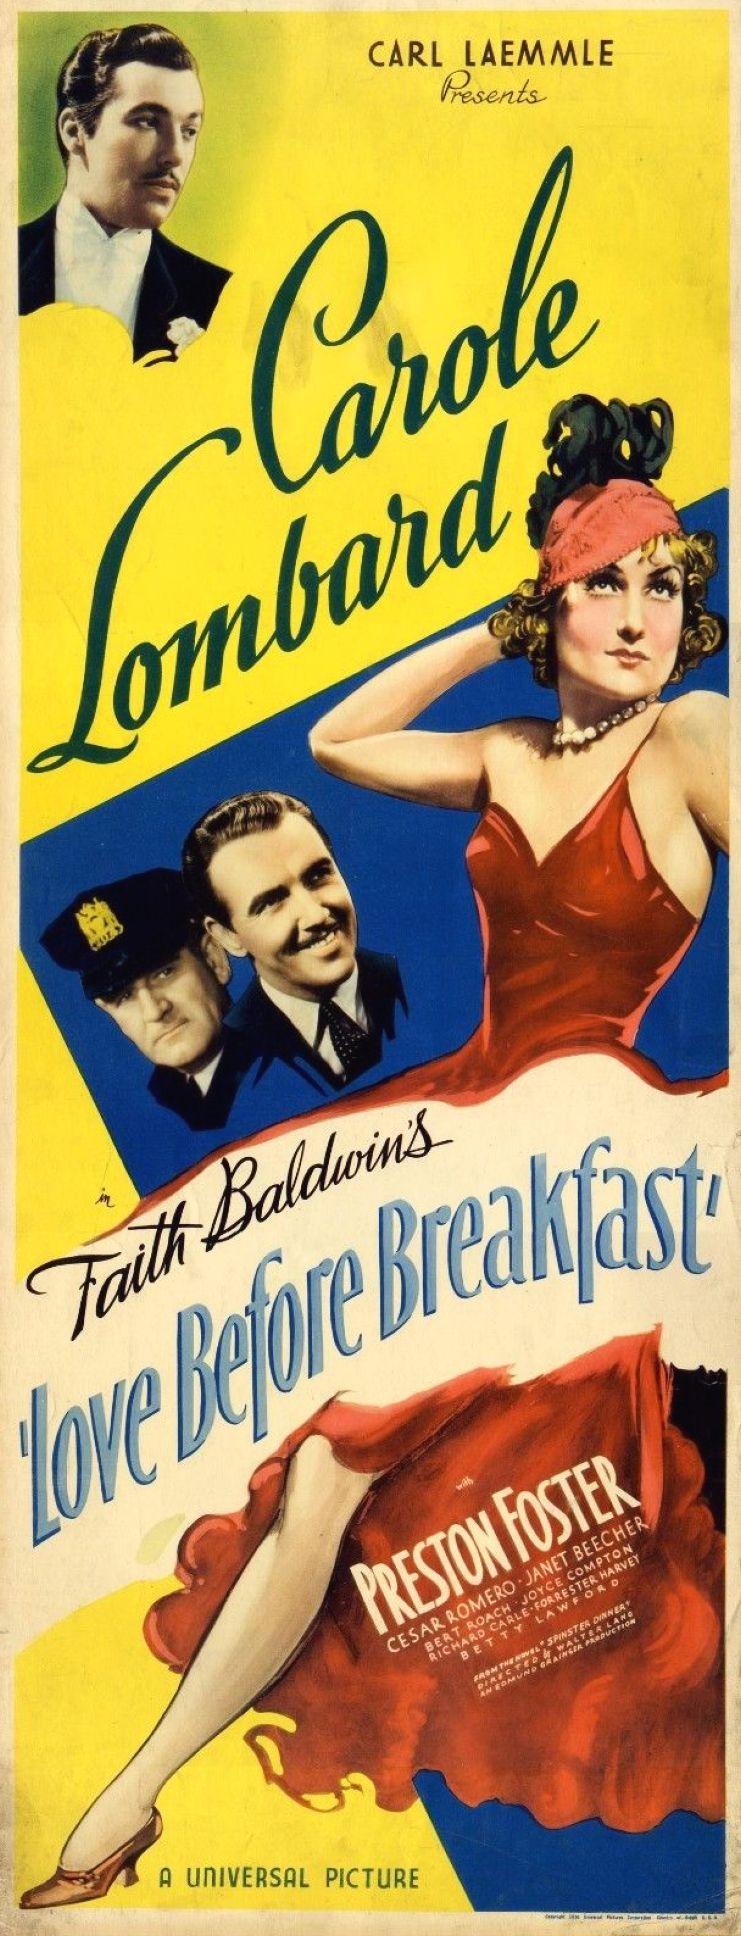 carole lombard love before breakfast poster 07b